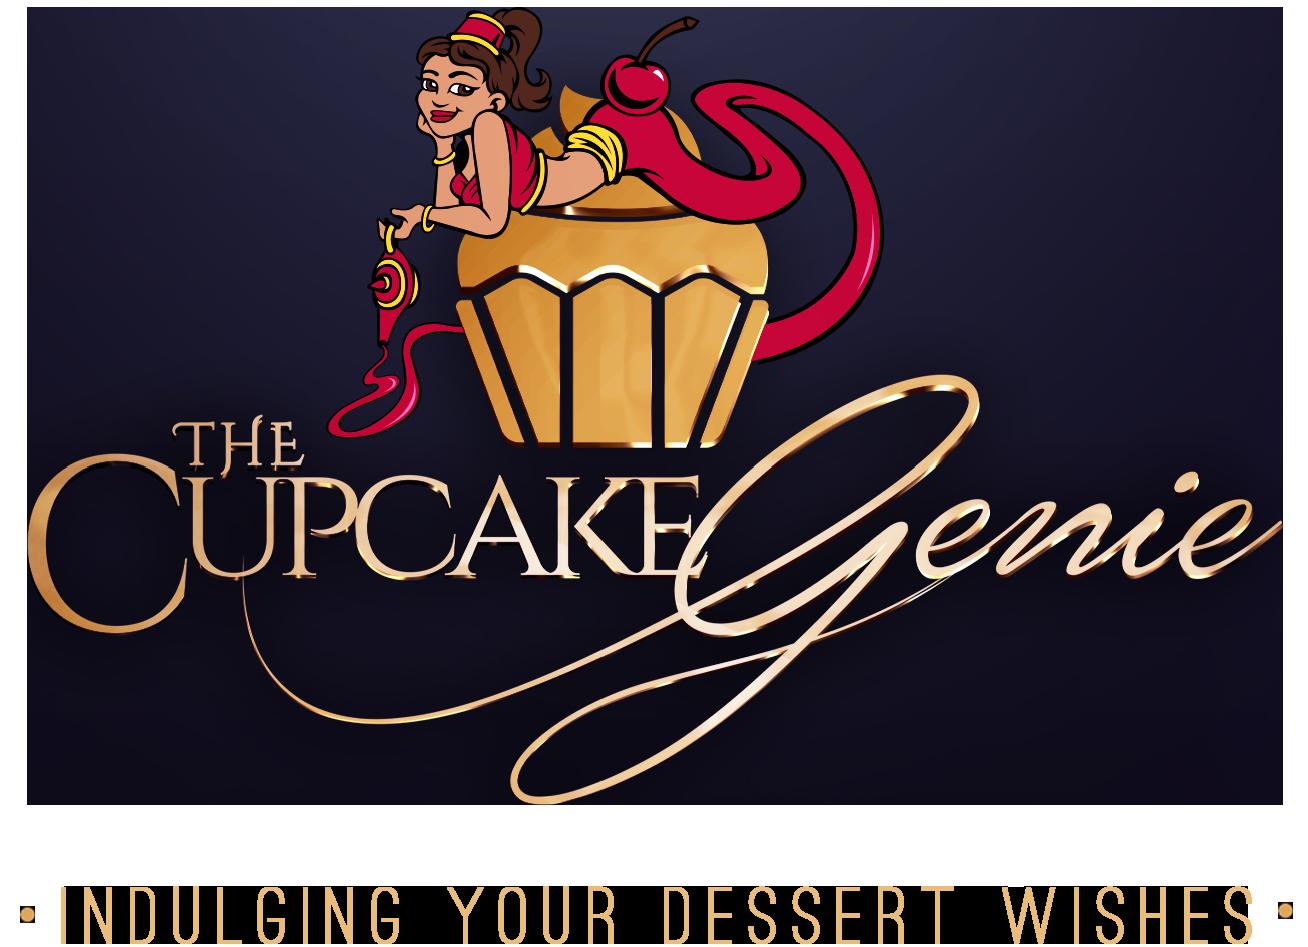 The Cupcake Genie